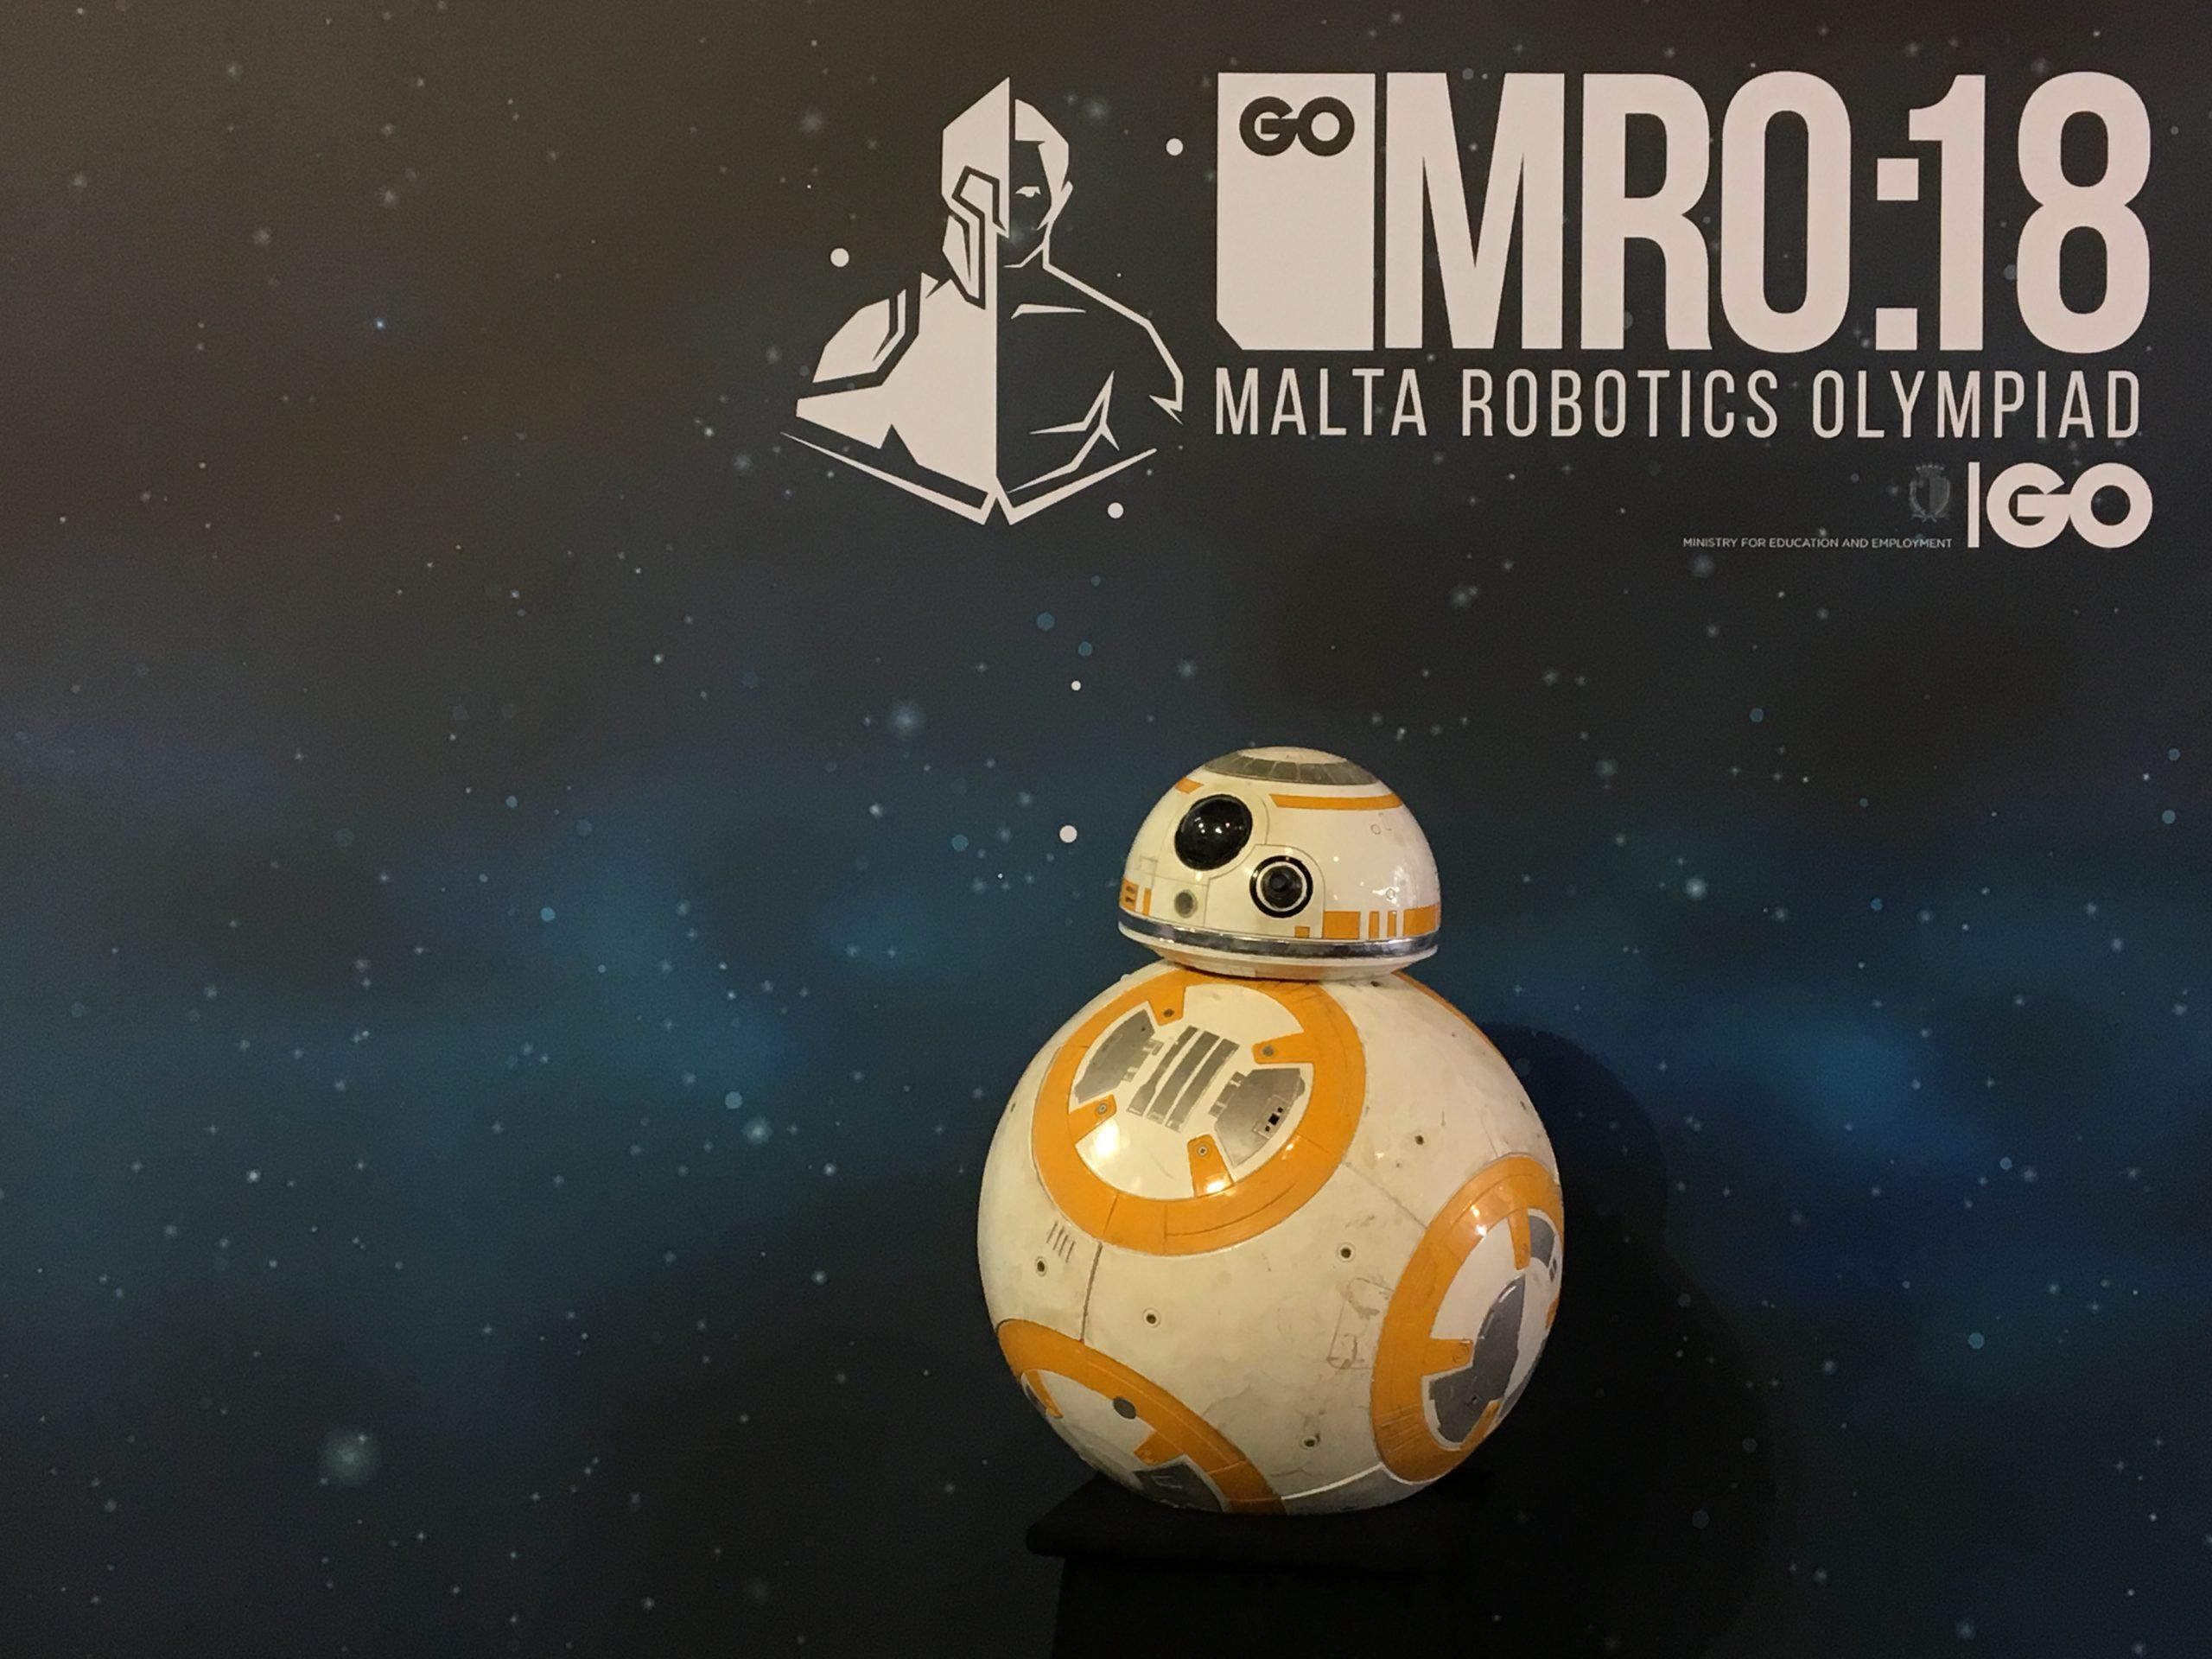 BB8 Go Malta Robotics Olympiad